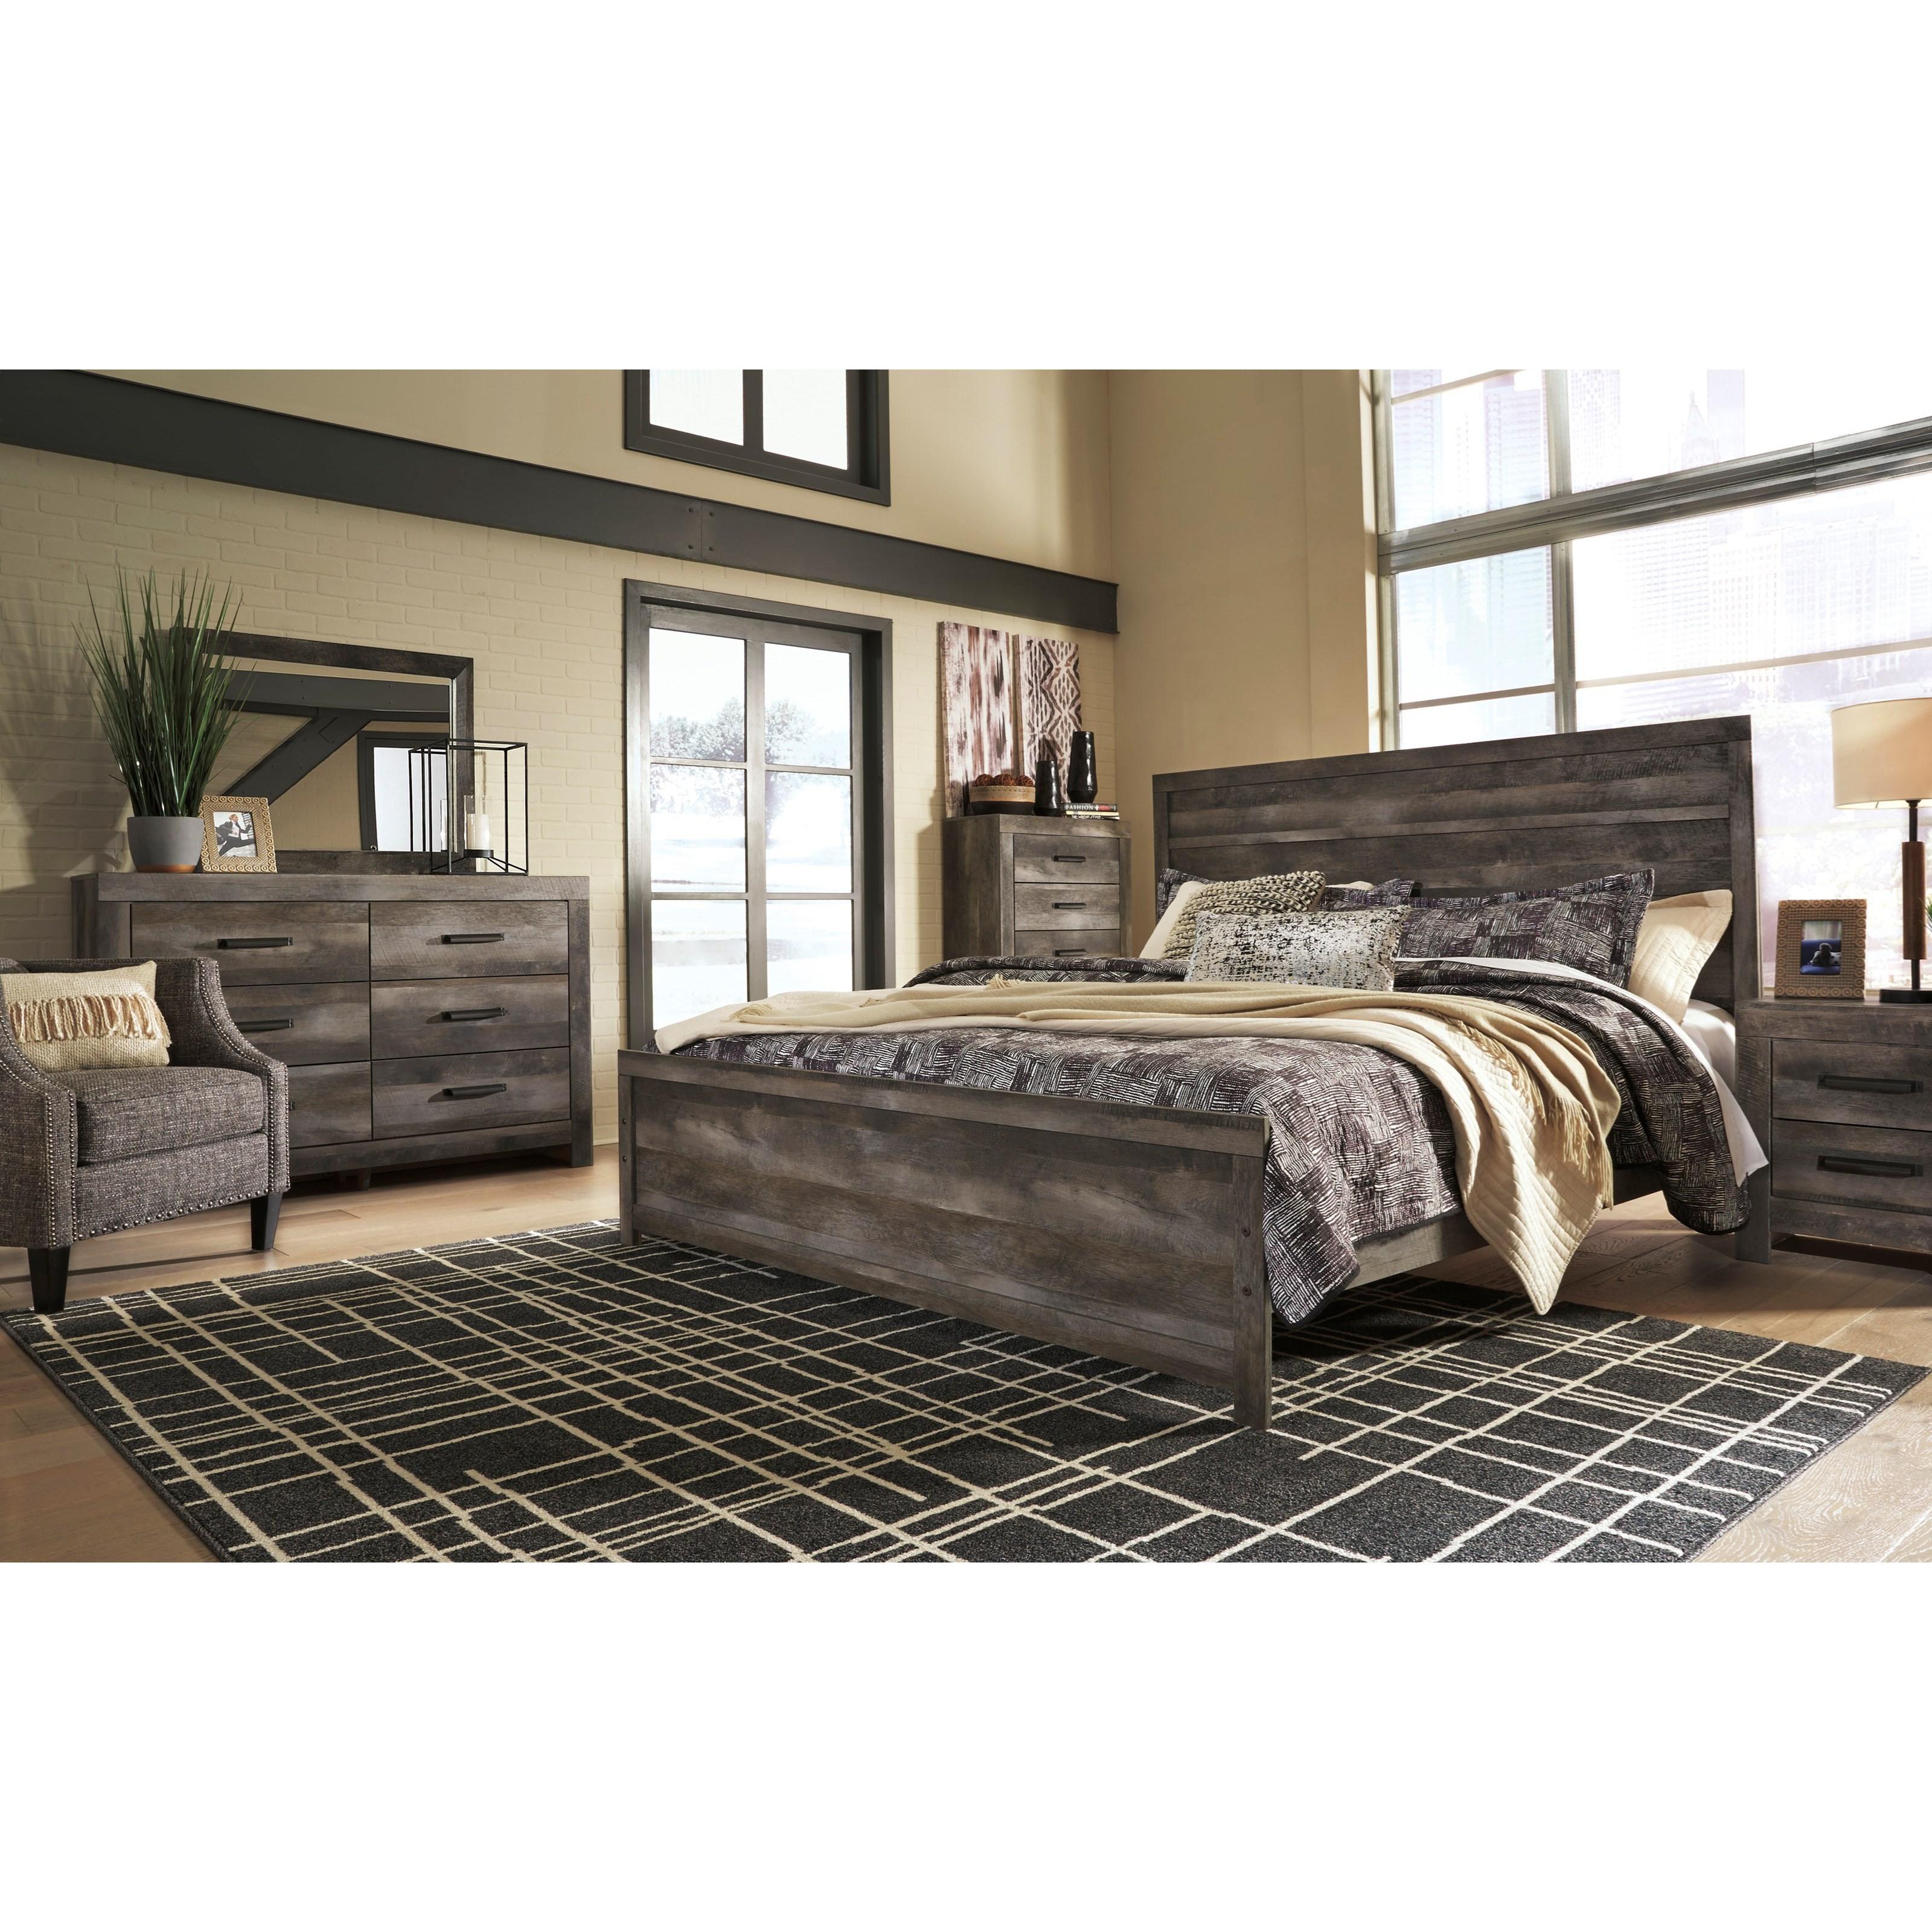 Ashley Furniture In Colorado: Signature Design By Ashley Wynnlow King Rustic Plank